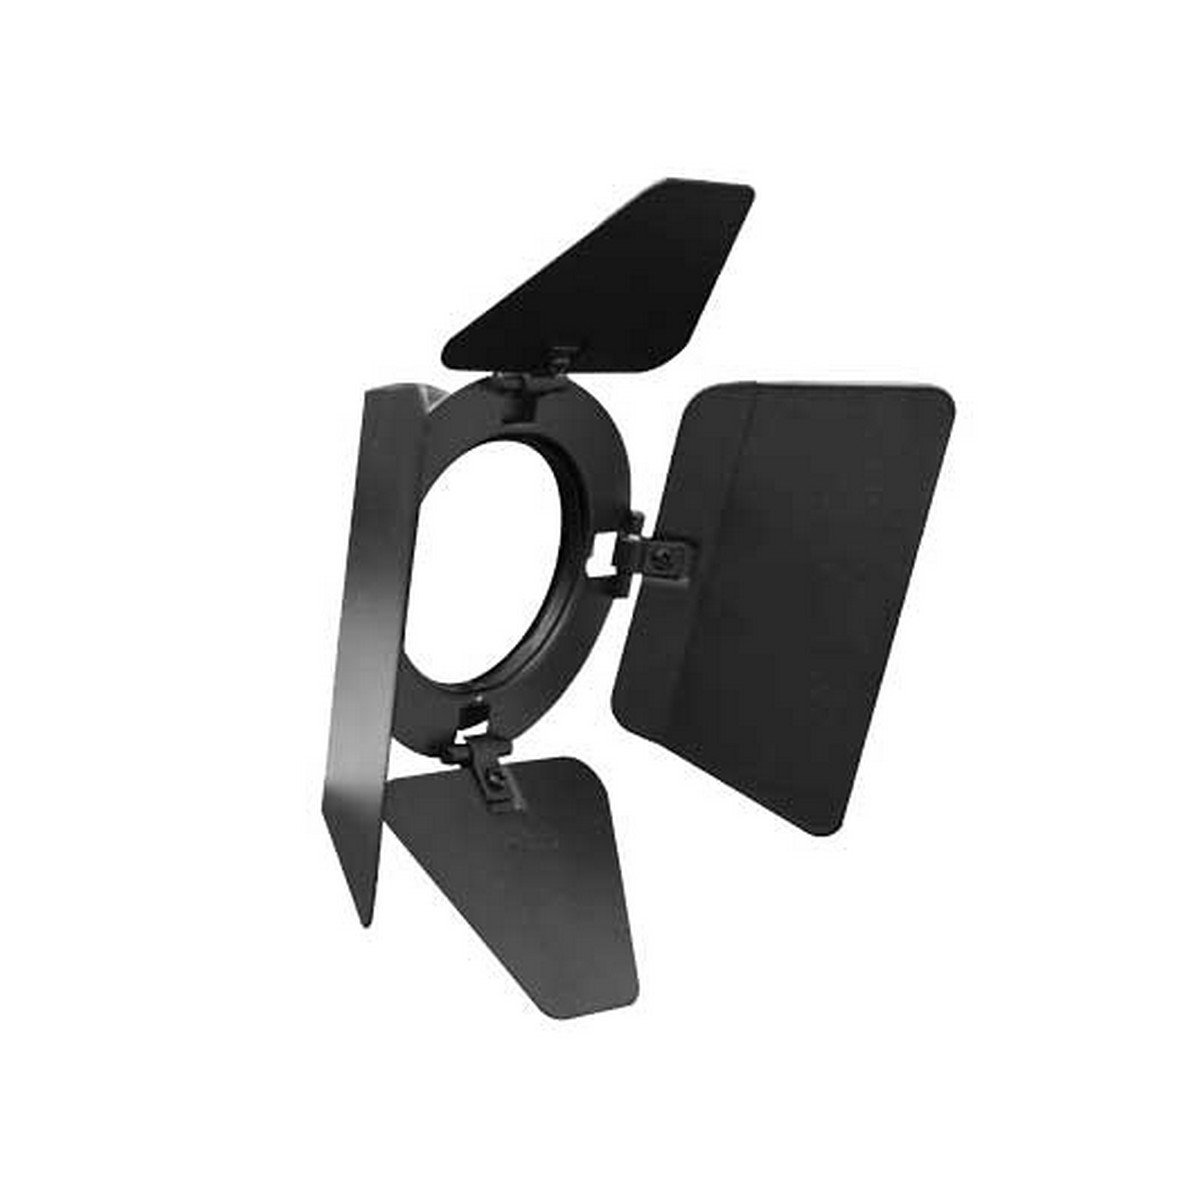 Odyssey Cases LSPAR16BDB | Black Barn Door for PAR 16 Odyssey Light Fixtures by ODYSSEY